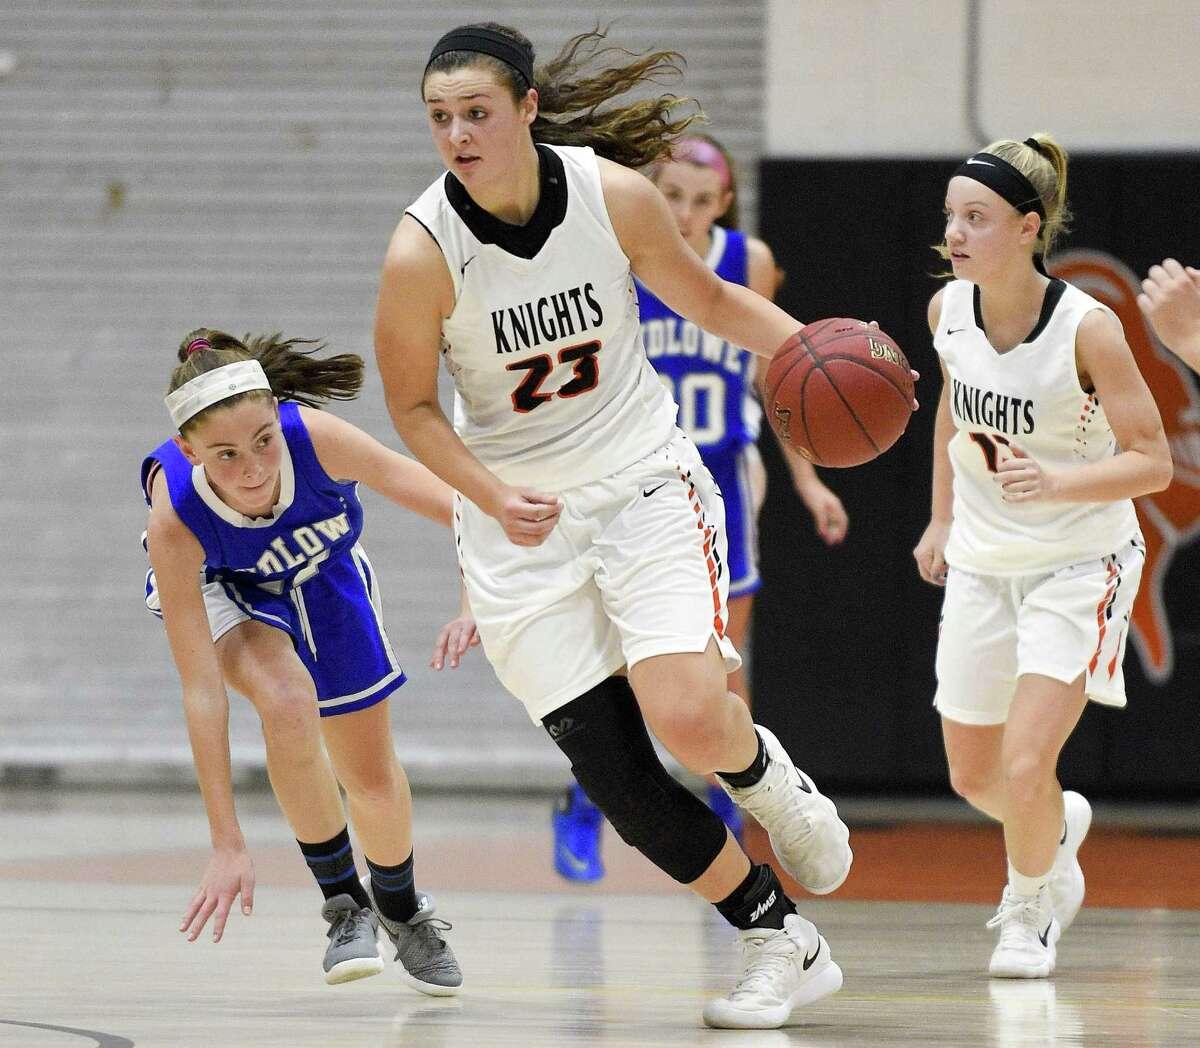 Alexa Kellner (23) Stamford defeated Fairfield Ludlowe 38-33 in a girls varsity basketball game at Stamford High School in Stamford, Conn. on Friday, Dec. 22, 2017.